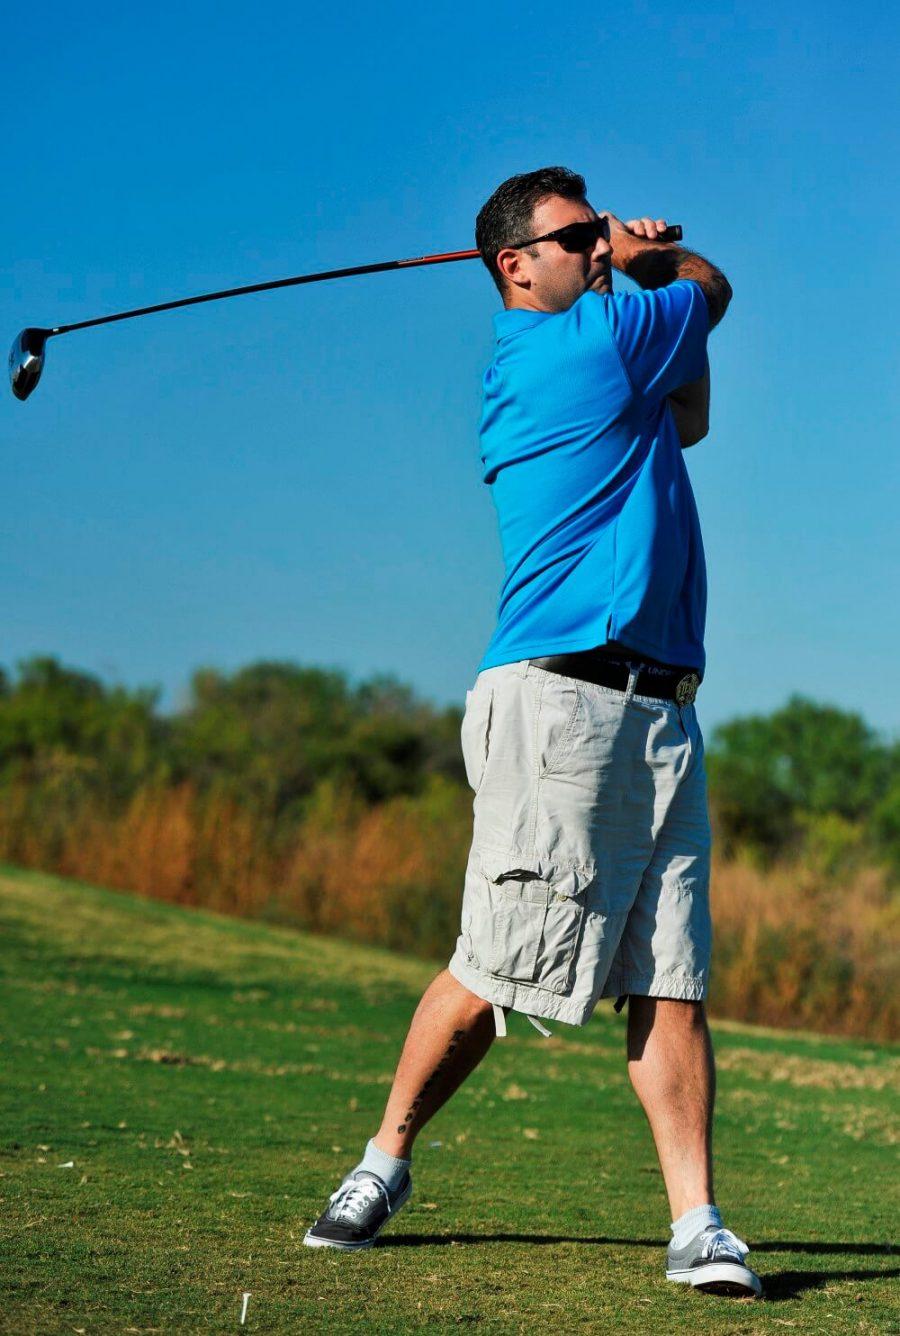 Golfer in blue shirt